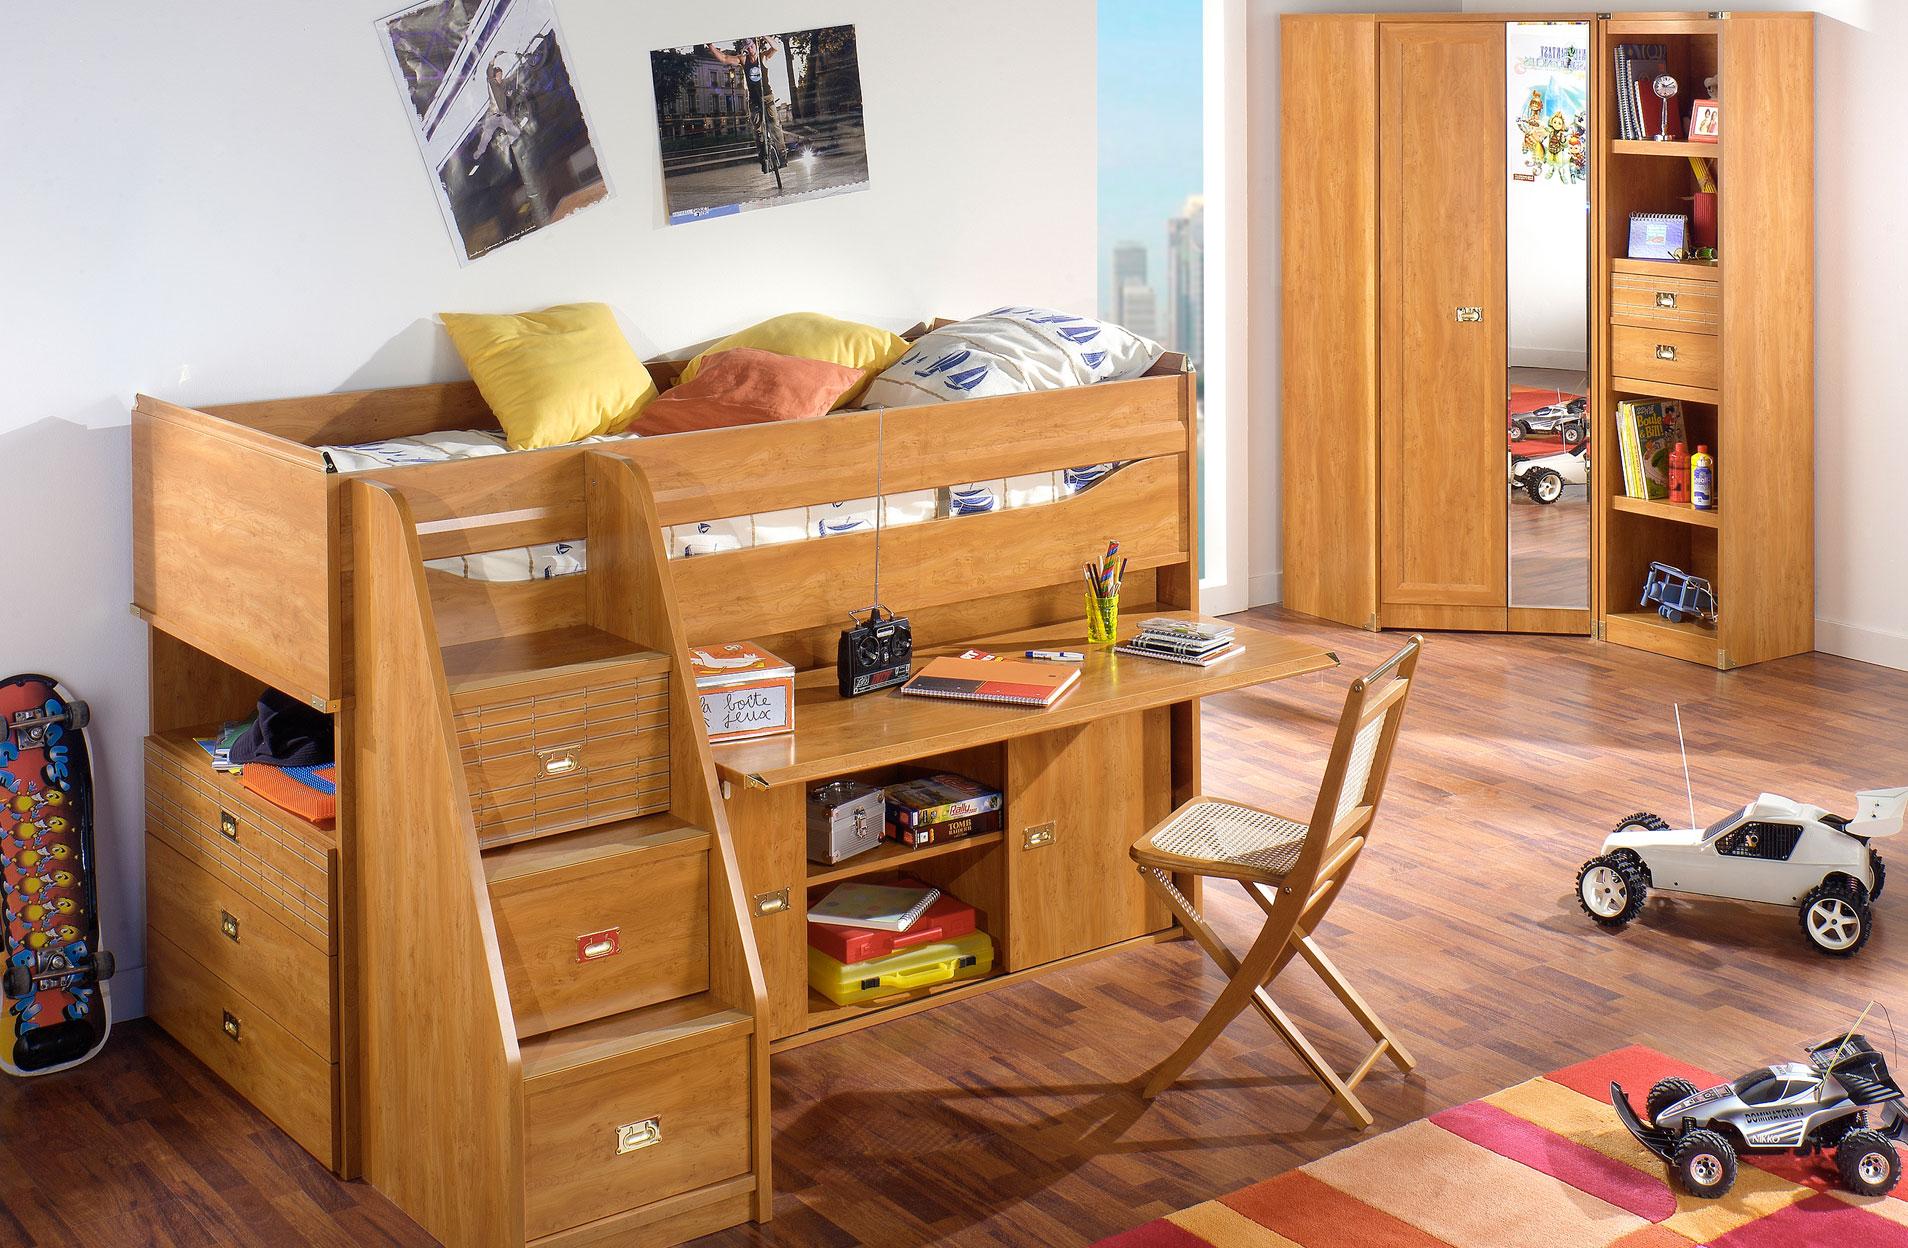 Inspiration d co lit superpos gautier calypso - Soldes meubles gautier ...